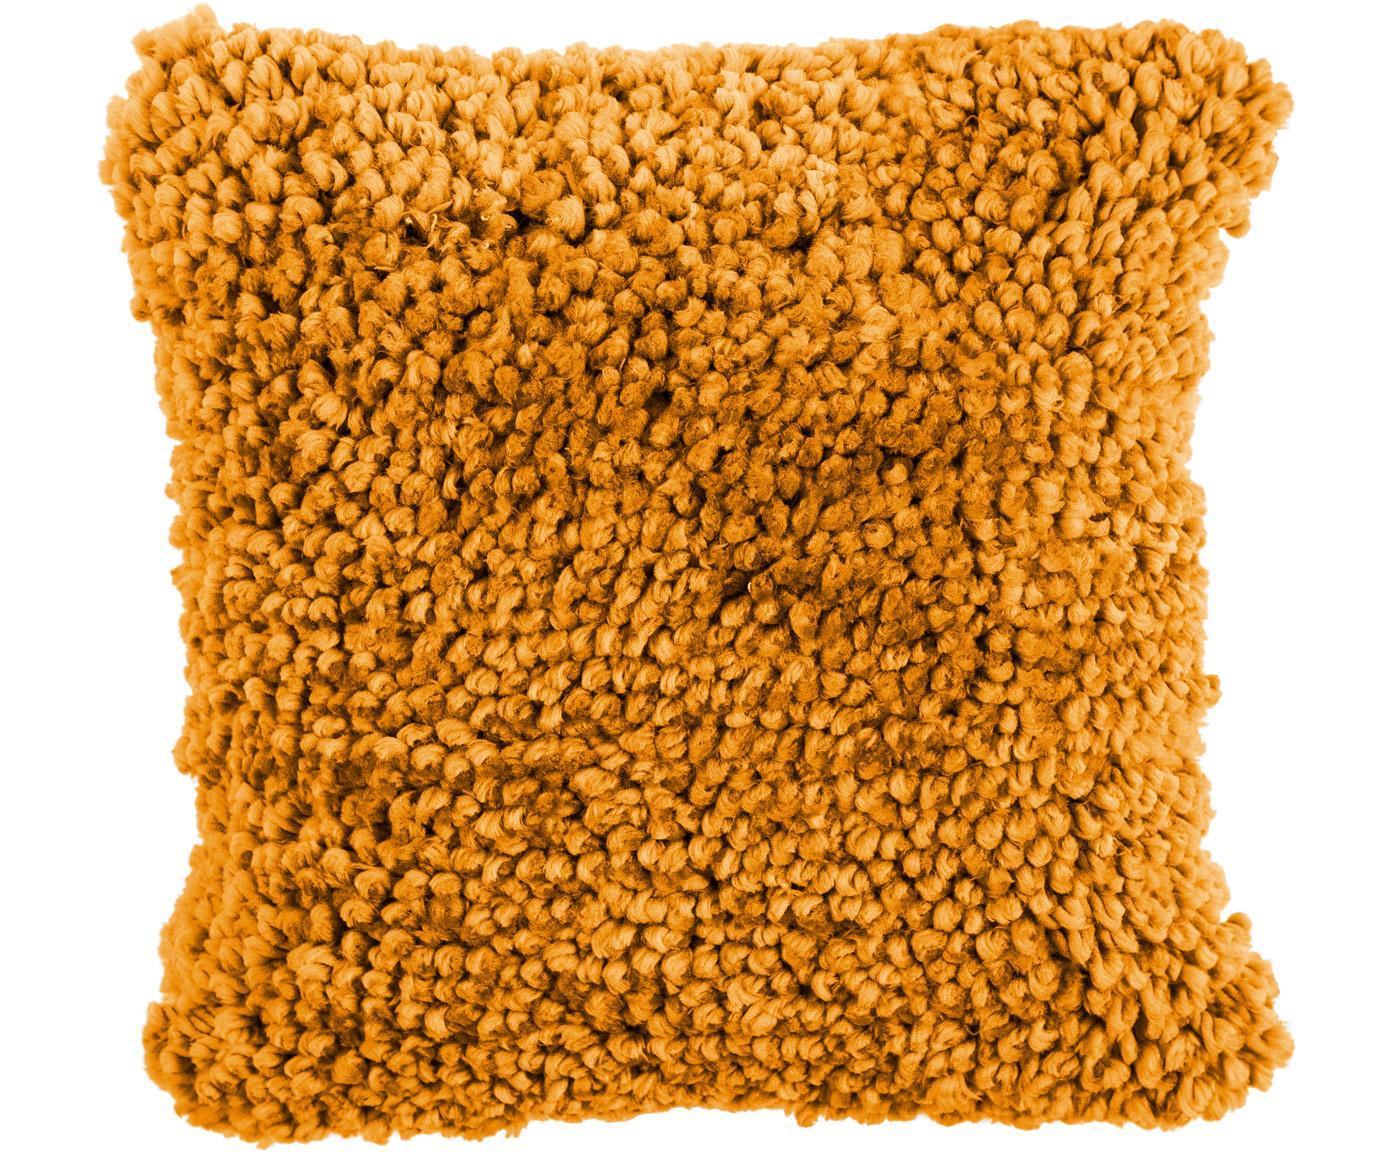 Kissen Oscar, mit Inlett, Bezug: 95% Baumwolle, 5% Acryl, Ockergelb, 50 x 50 cm